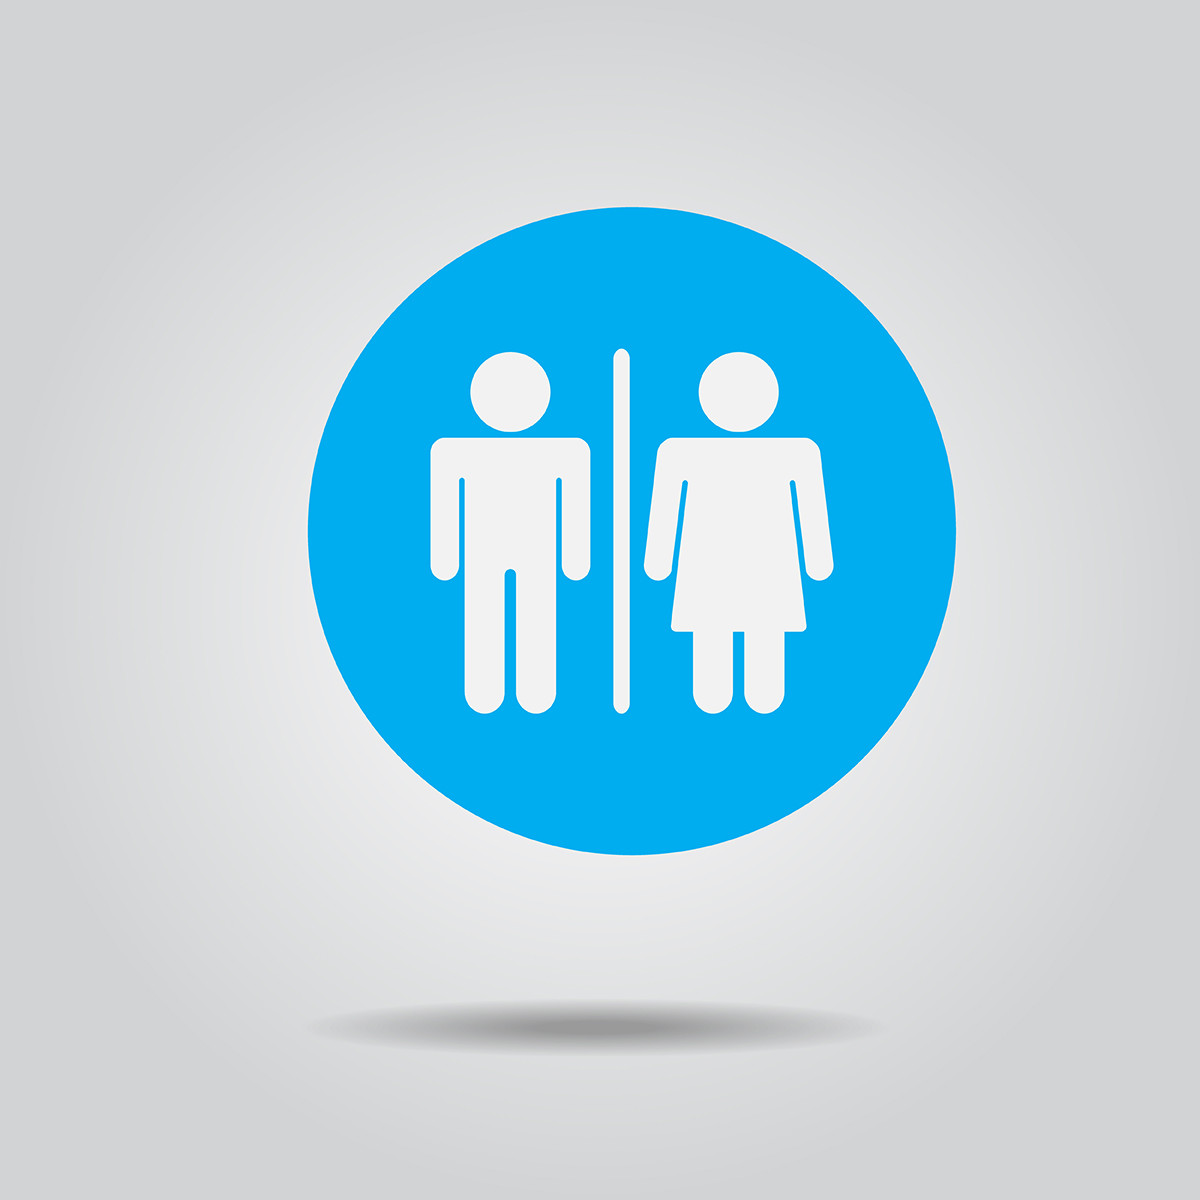 Frequent urination a symptom of diabetes